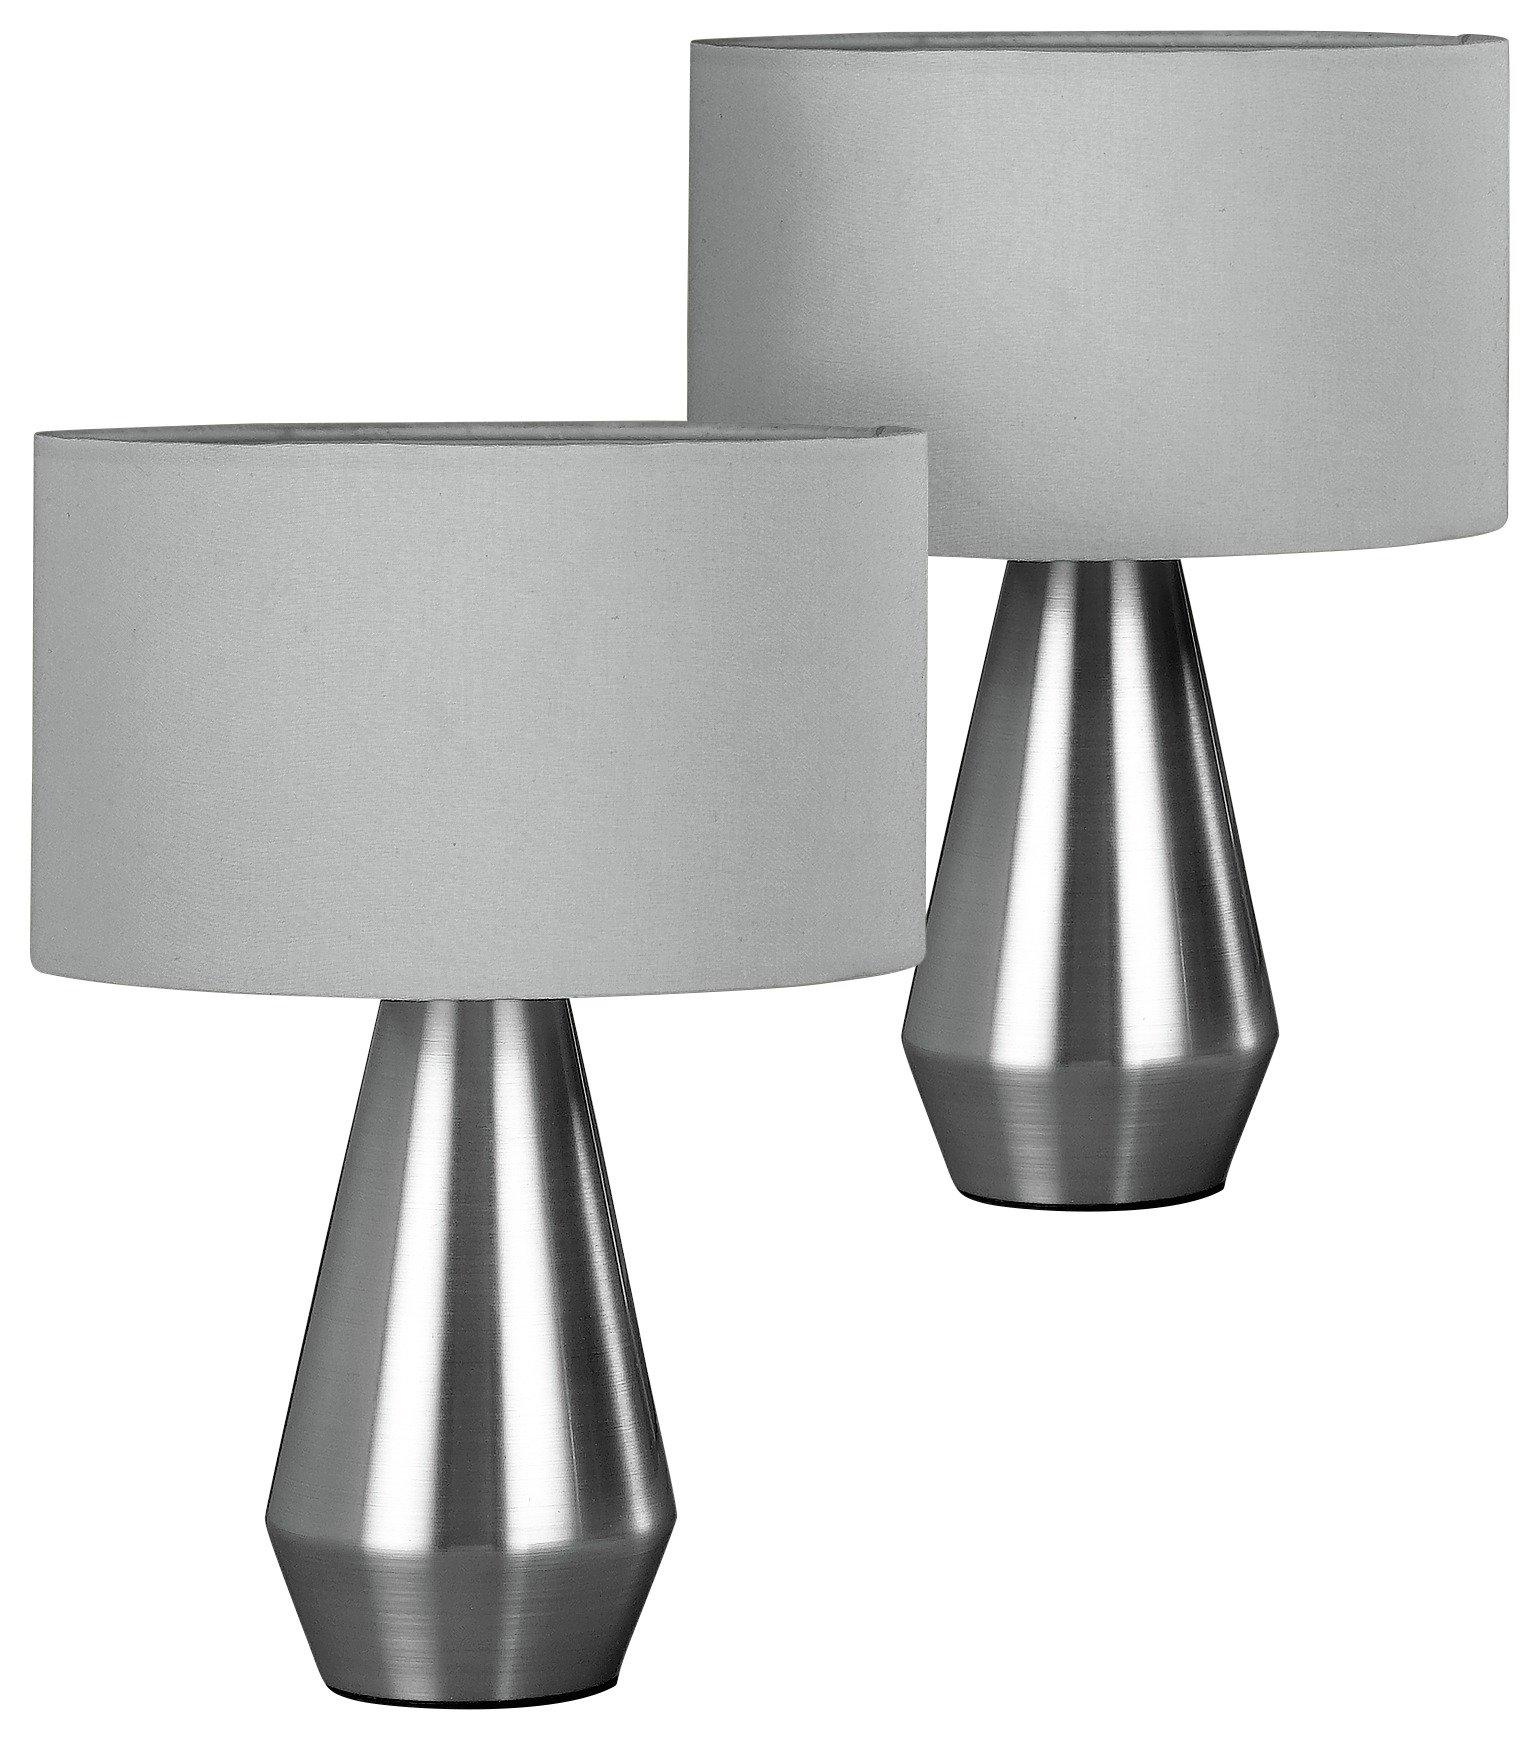 buy habitat pair of maya table touch lamps - grey | table lamps | argos